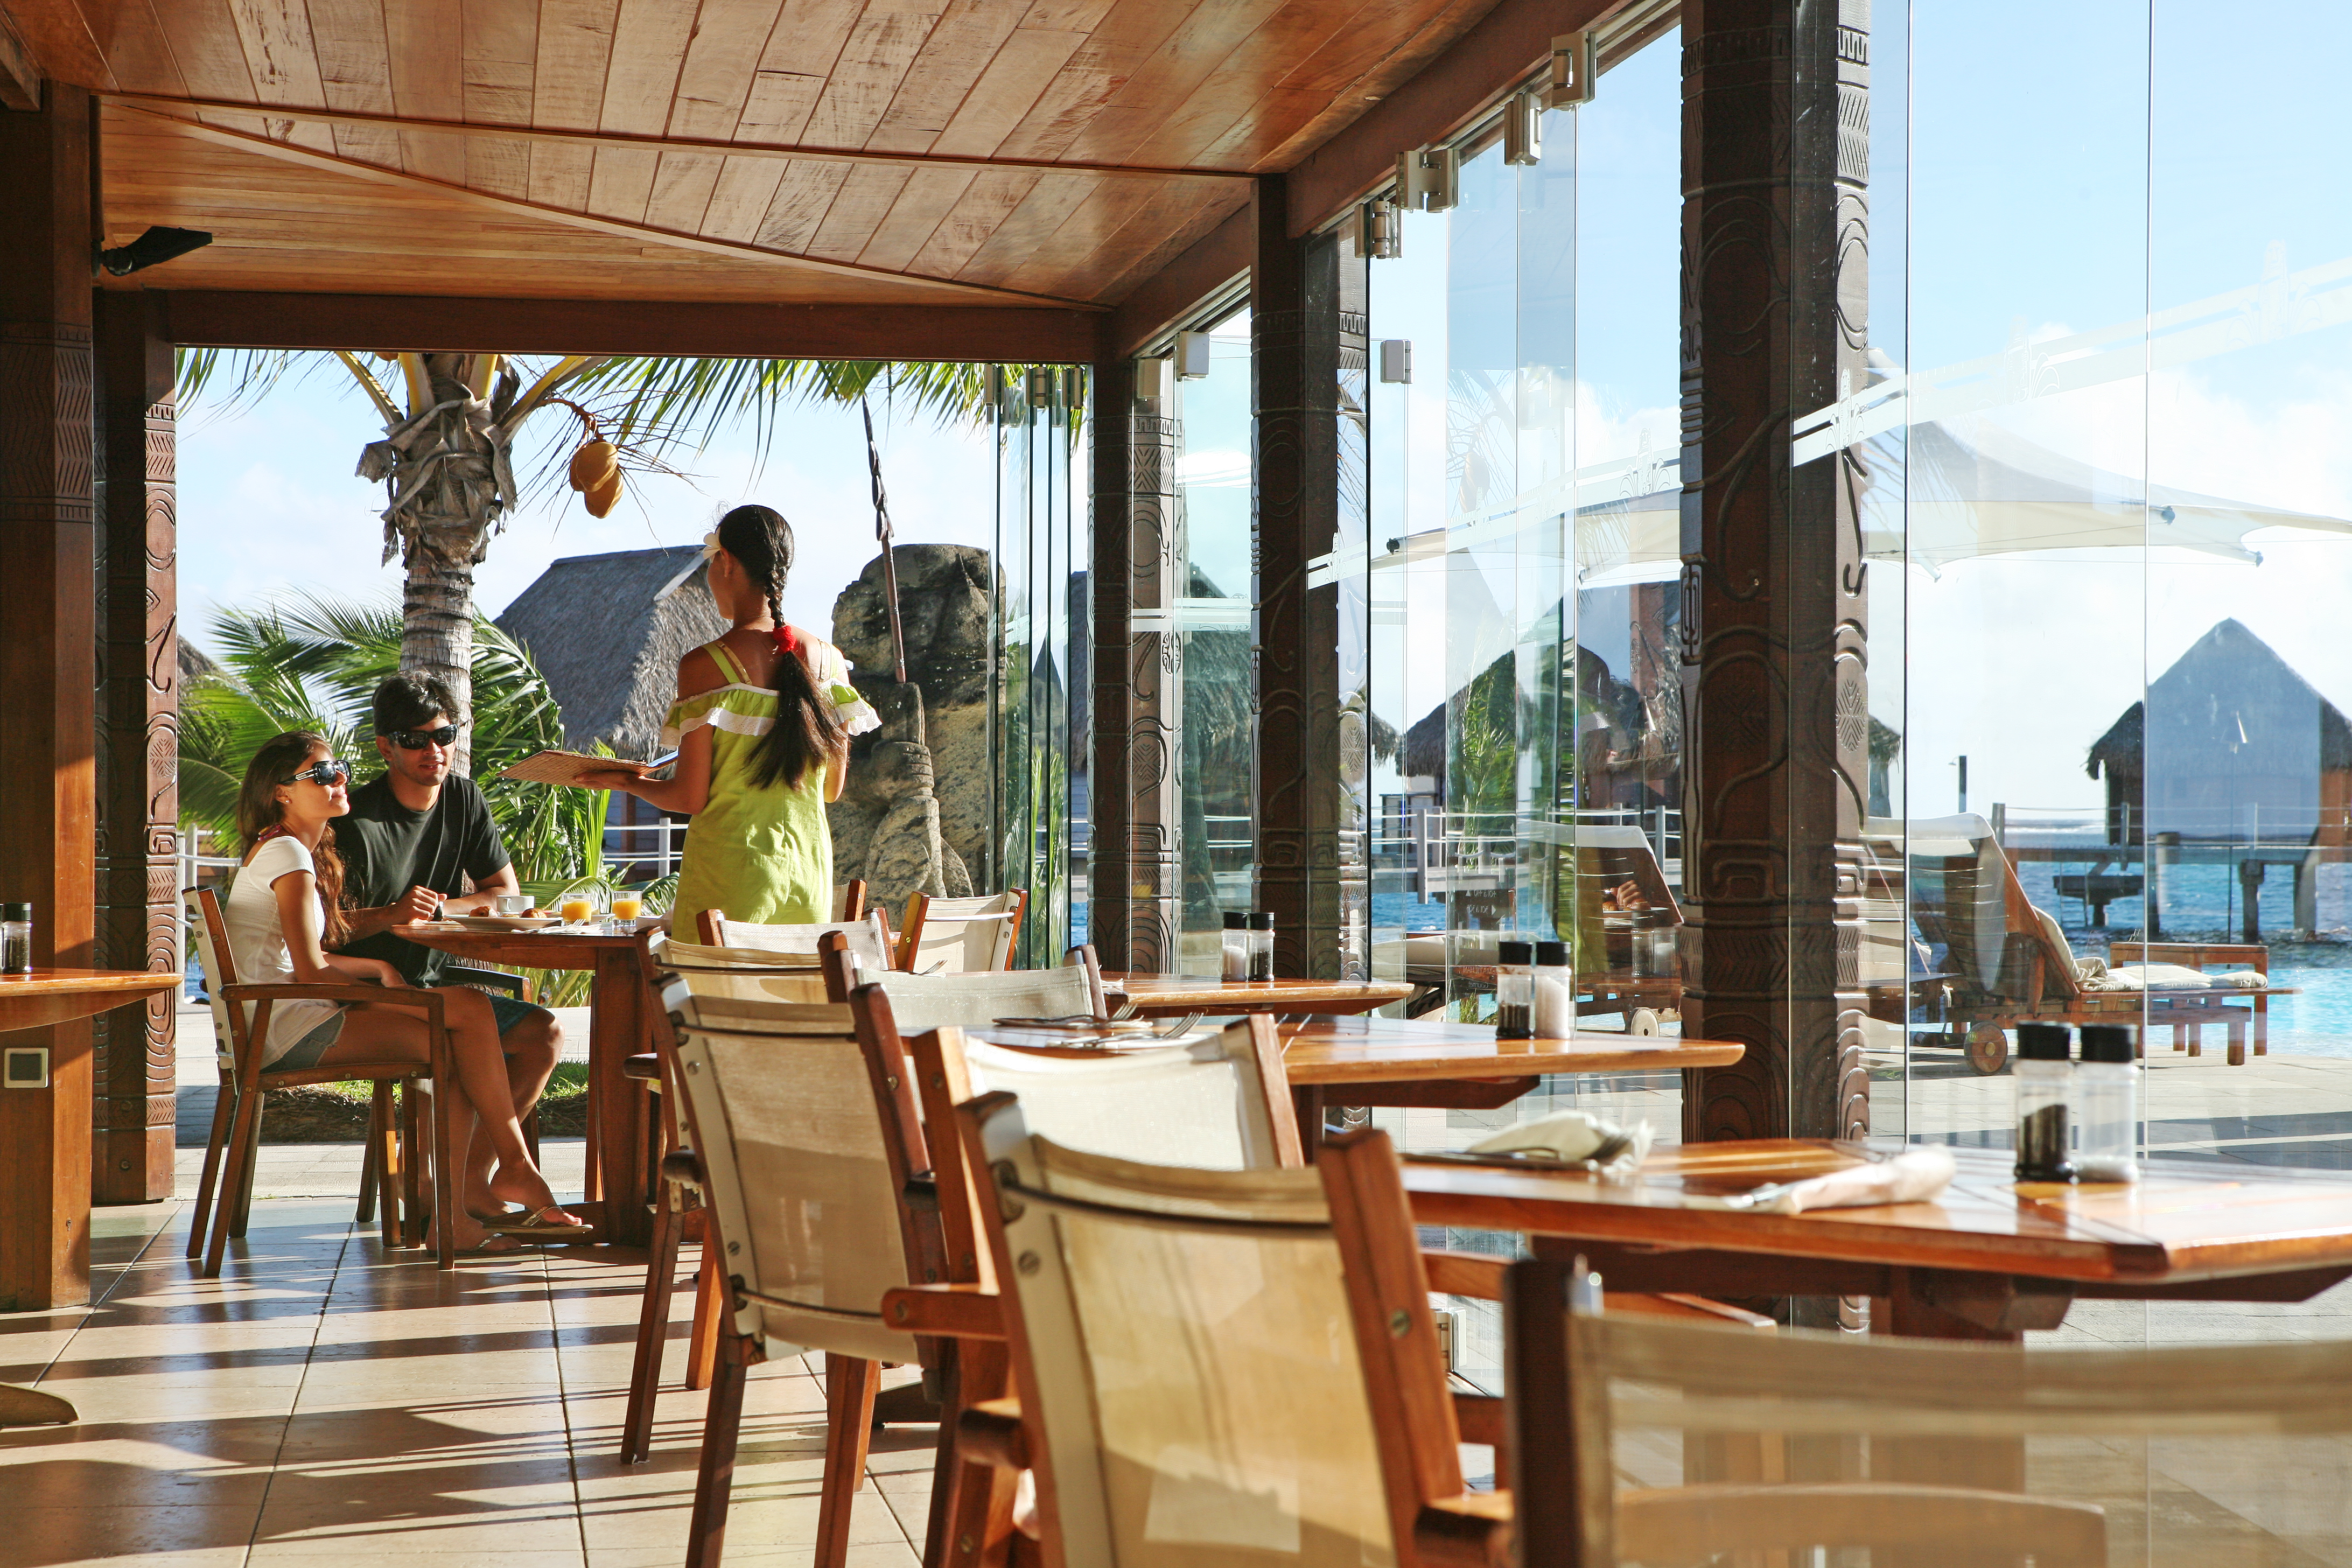 https://tahititourisme.nz/wp-content/uploads/2018/03/RESTAURATION-Restaurant-Mahanai-3-Greg_LeBacon.jpg